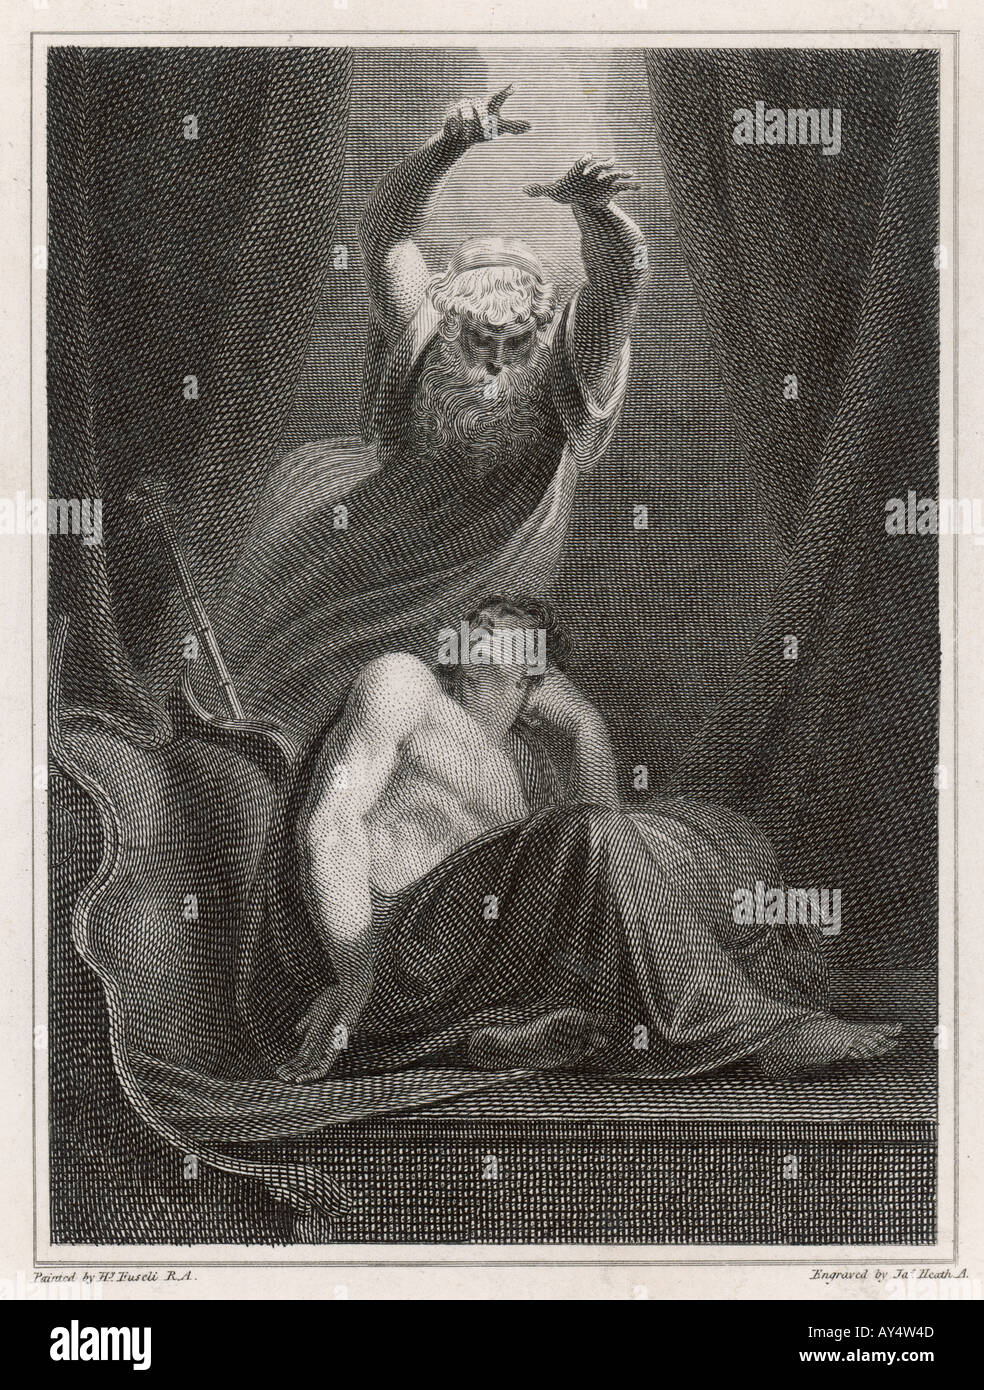 Myth Iliad Agamemnon - Stock Image